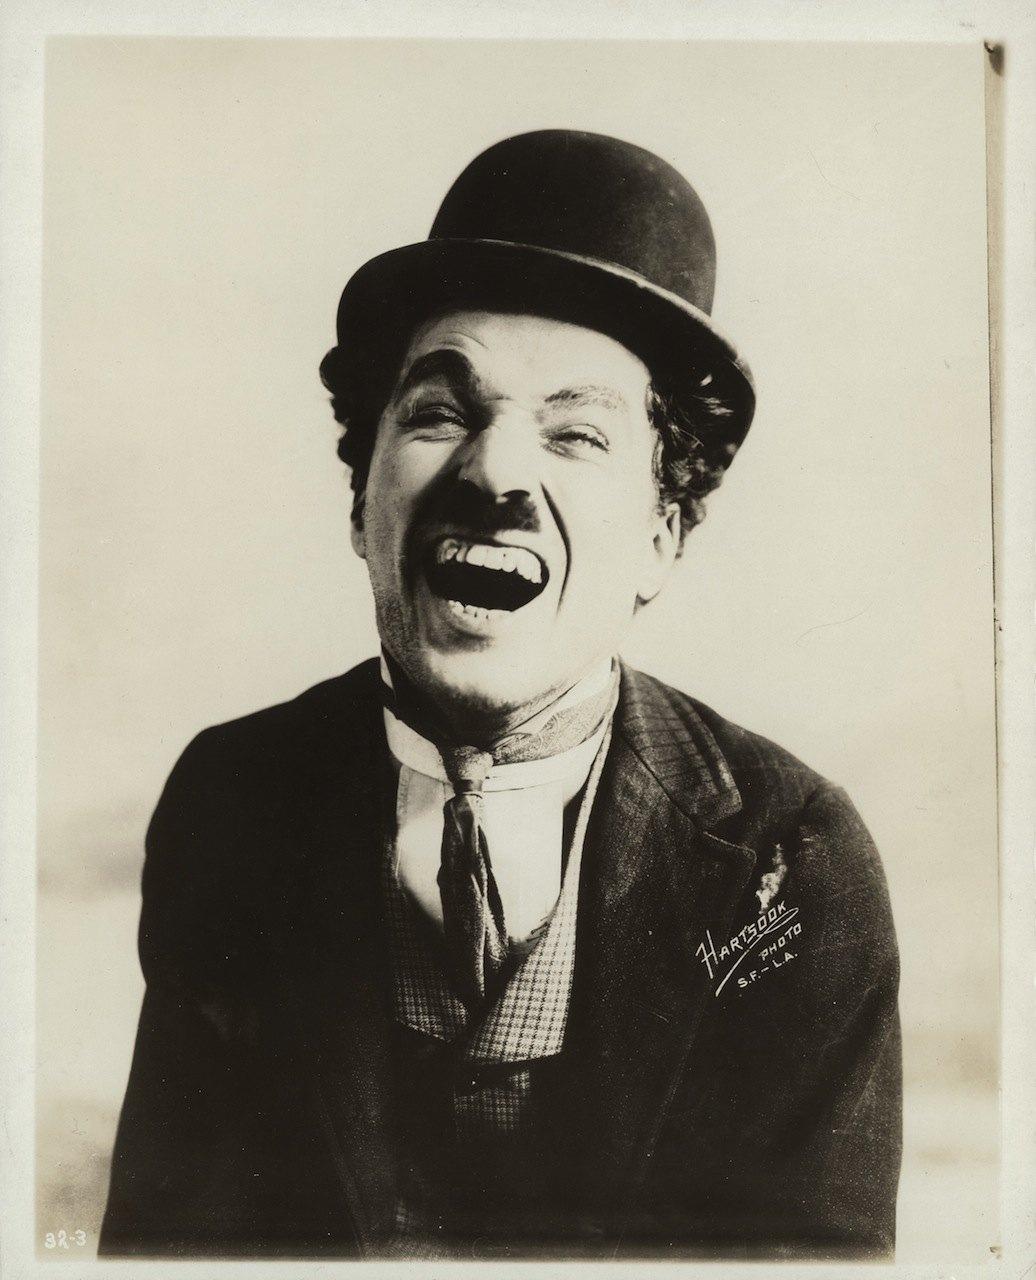 Jaeger-LeCoultre rinde homenaje a Charlie Chaplin